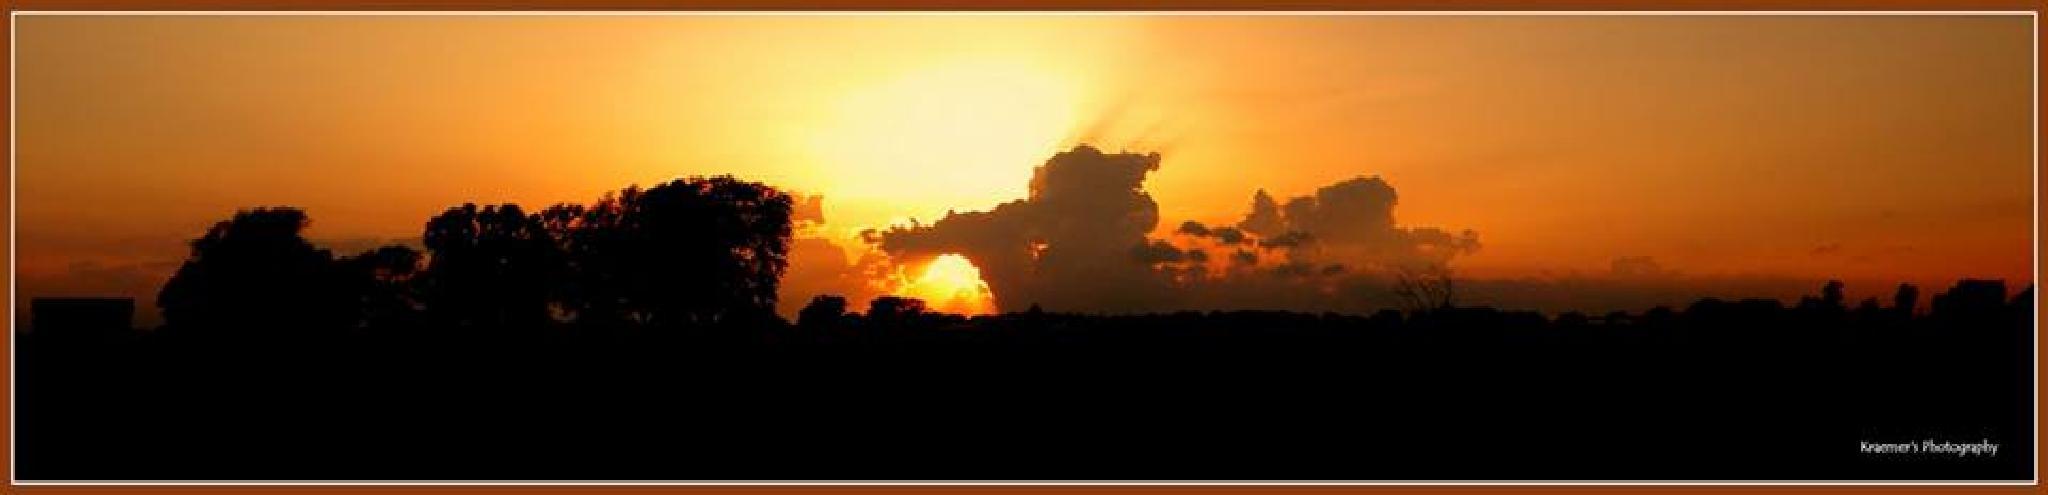 Panel sunset by Trish Kraemer